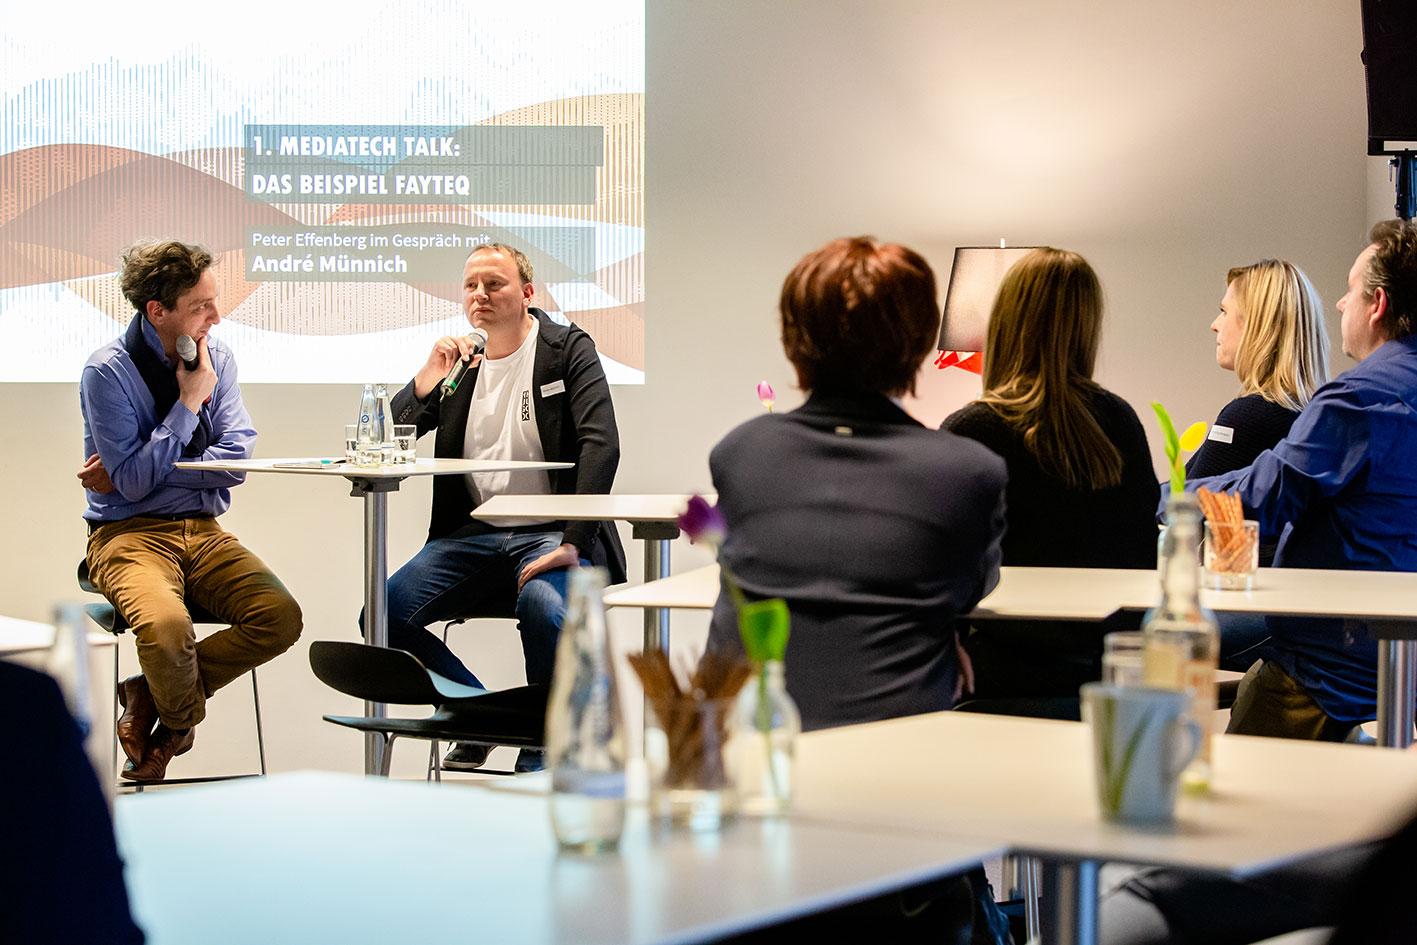 MediaTech Talk with André Muennich